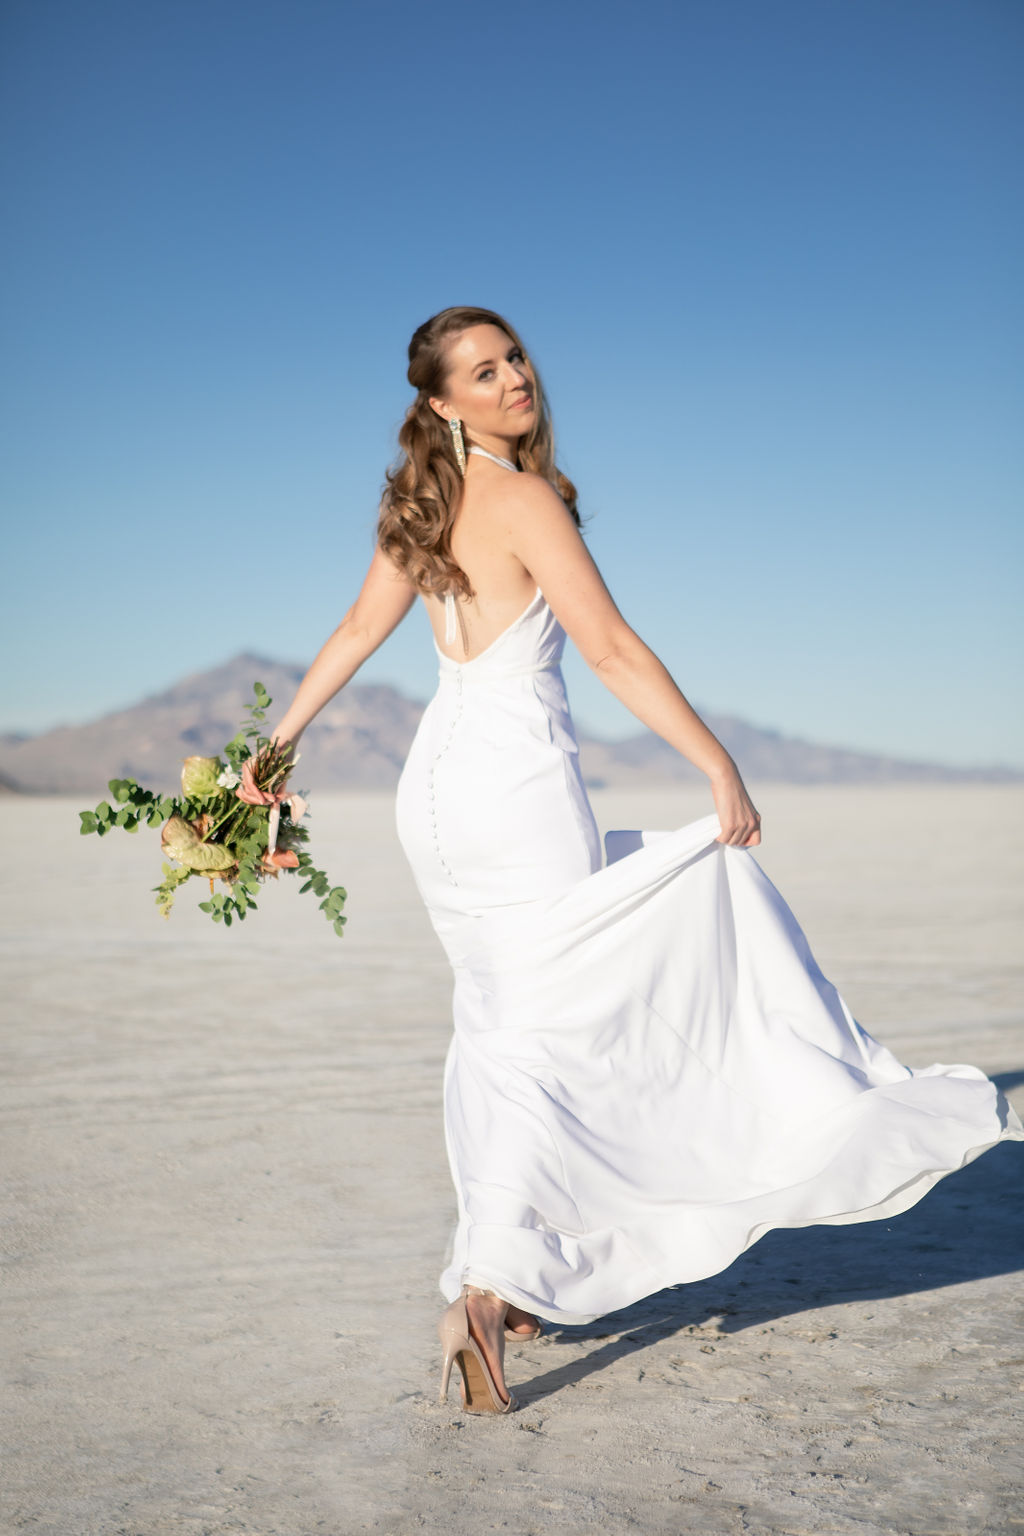 Simple Elegant Modern Goli June Brighton Wedding Dress Victoria Chukarov Salt Flats Utah 4